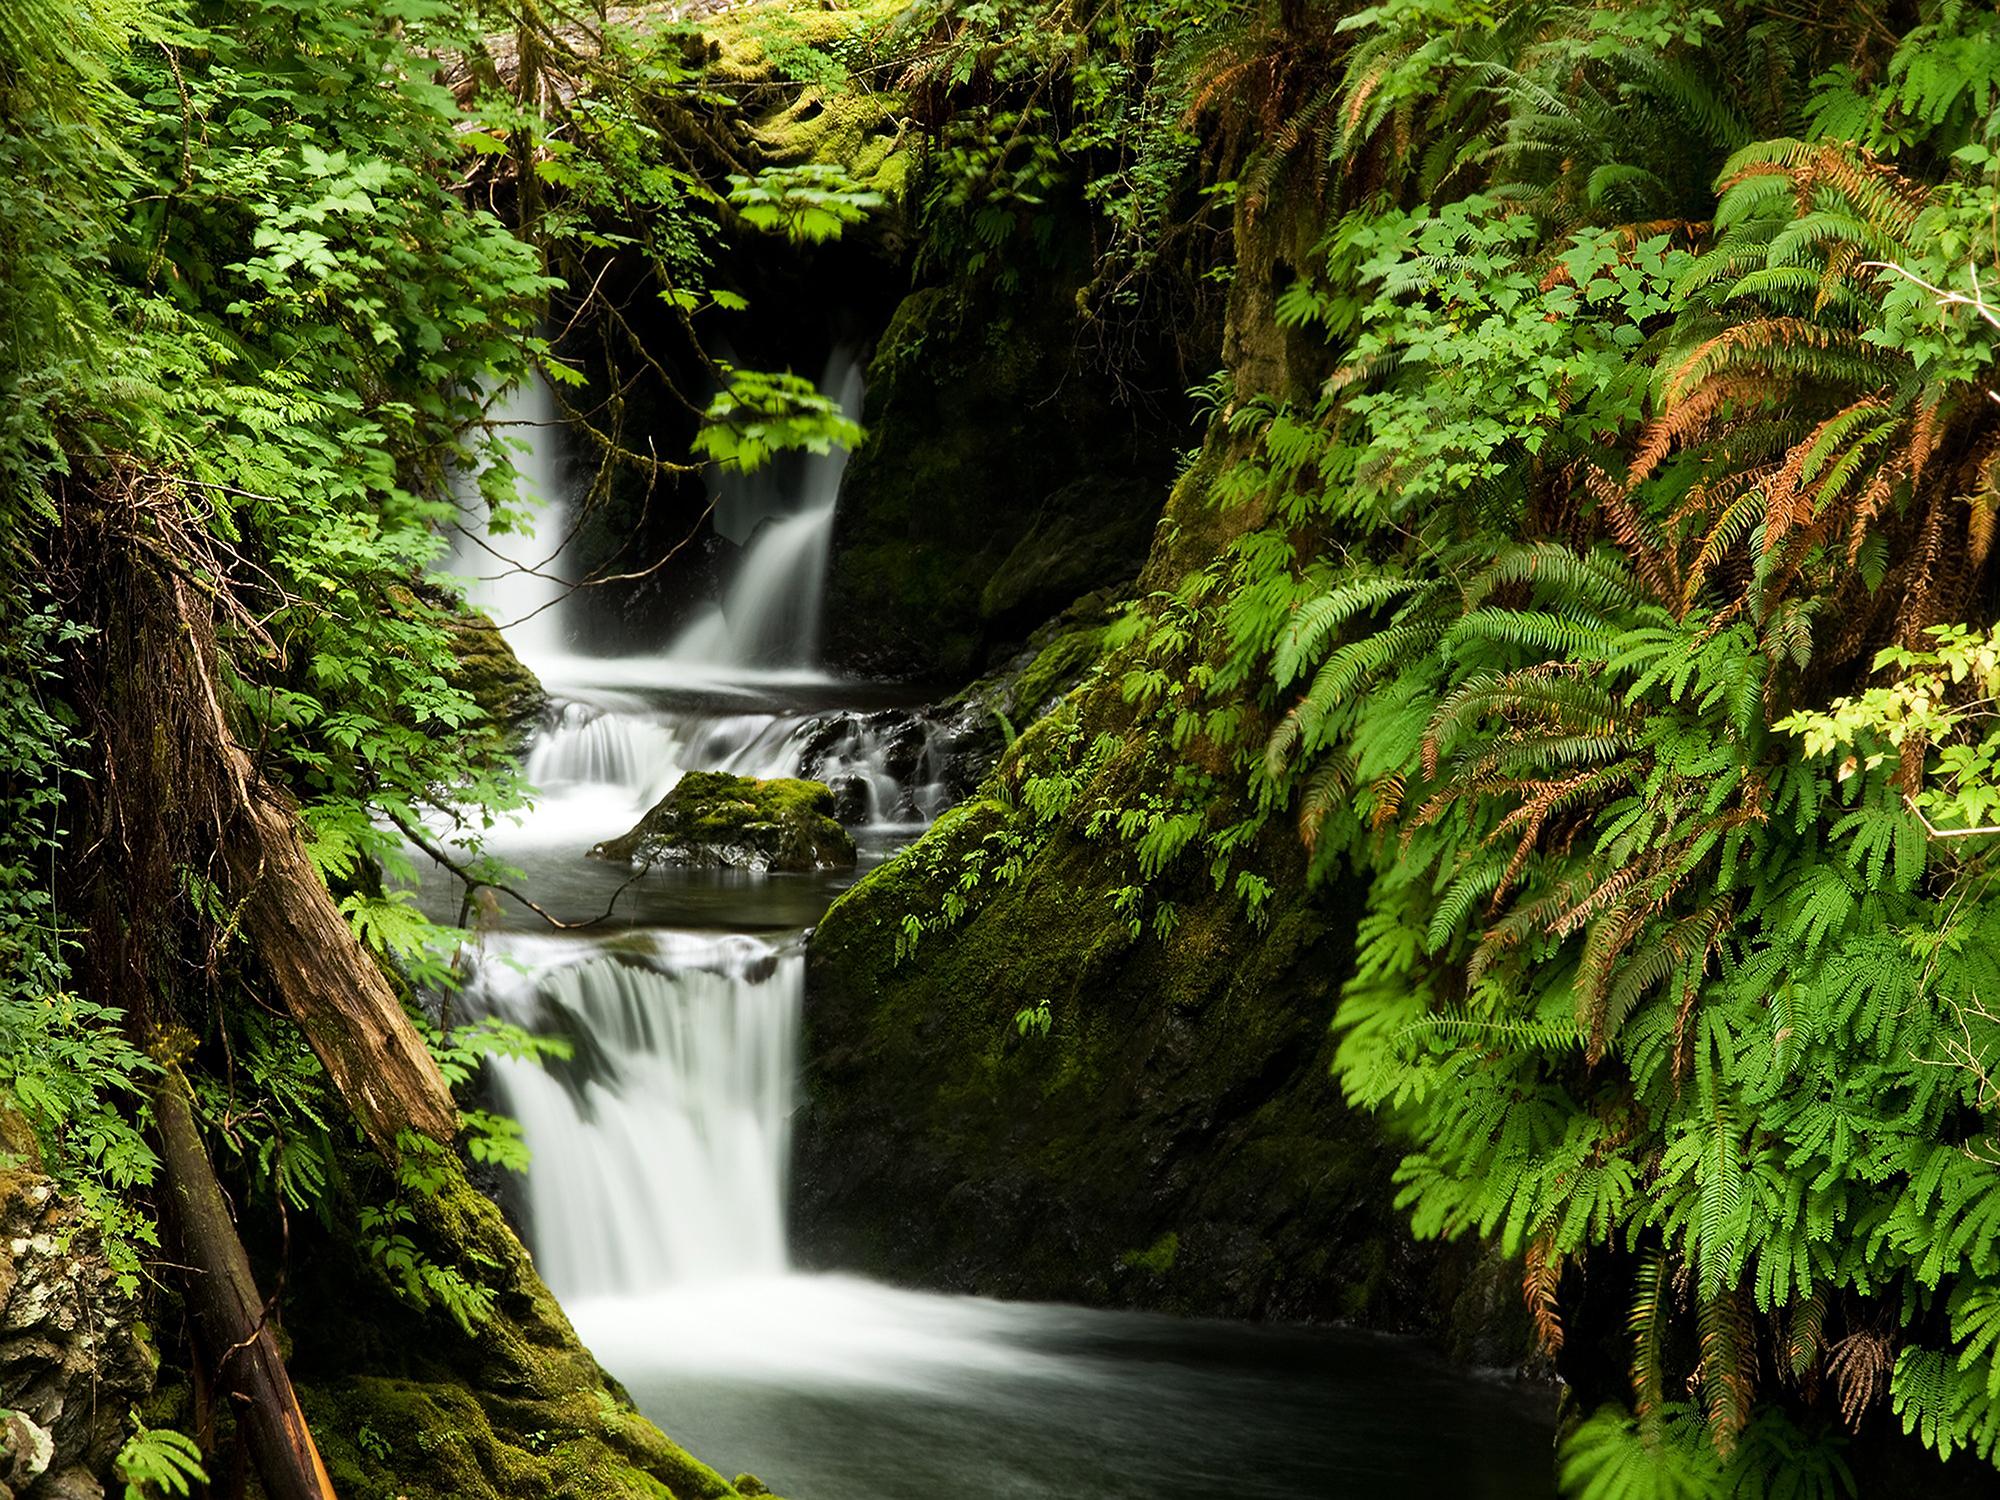 Quinault Rain Forest No. 1